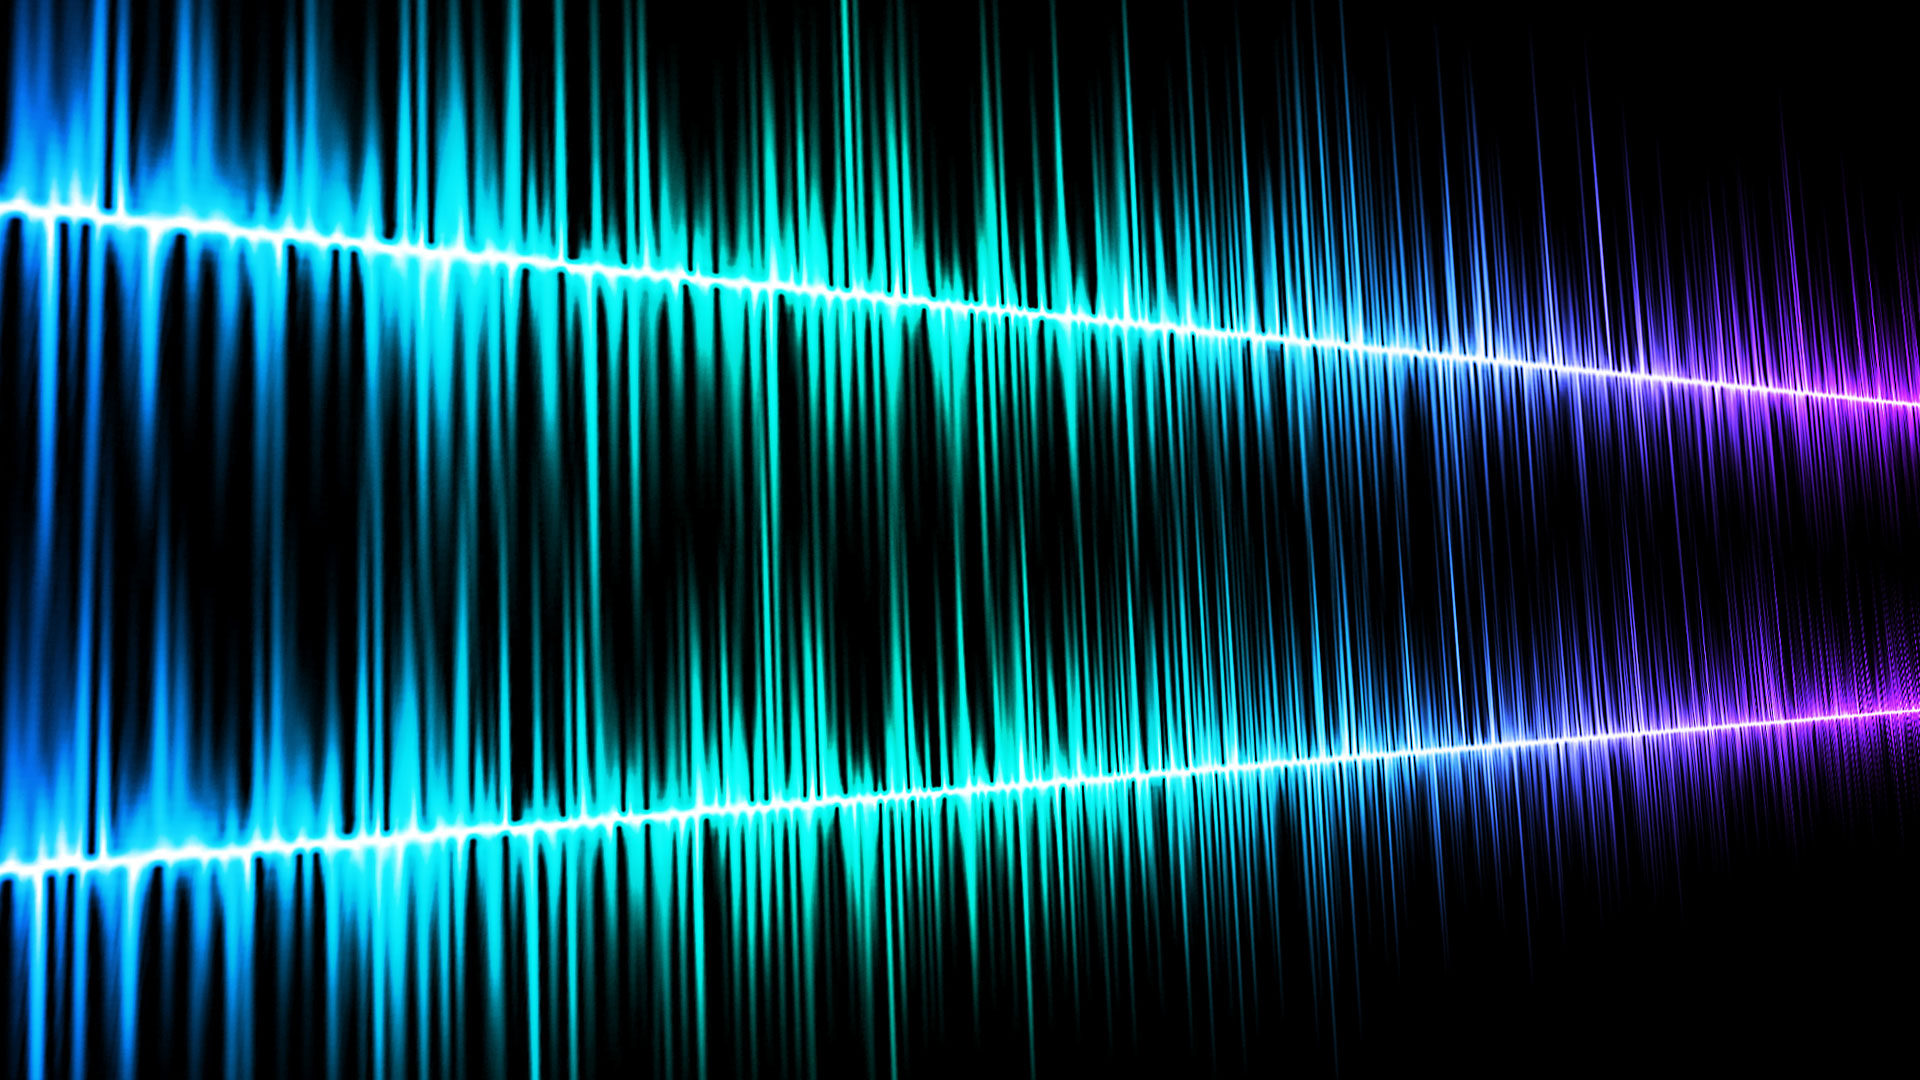 Waveform effect